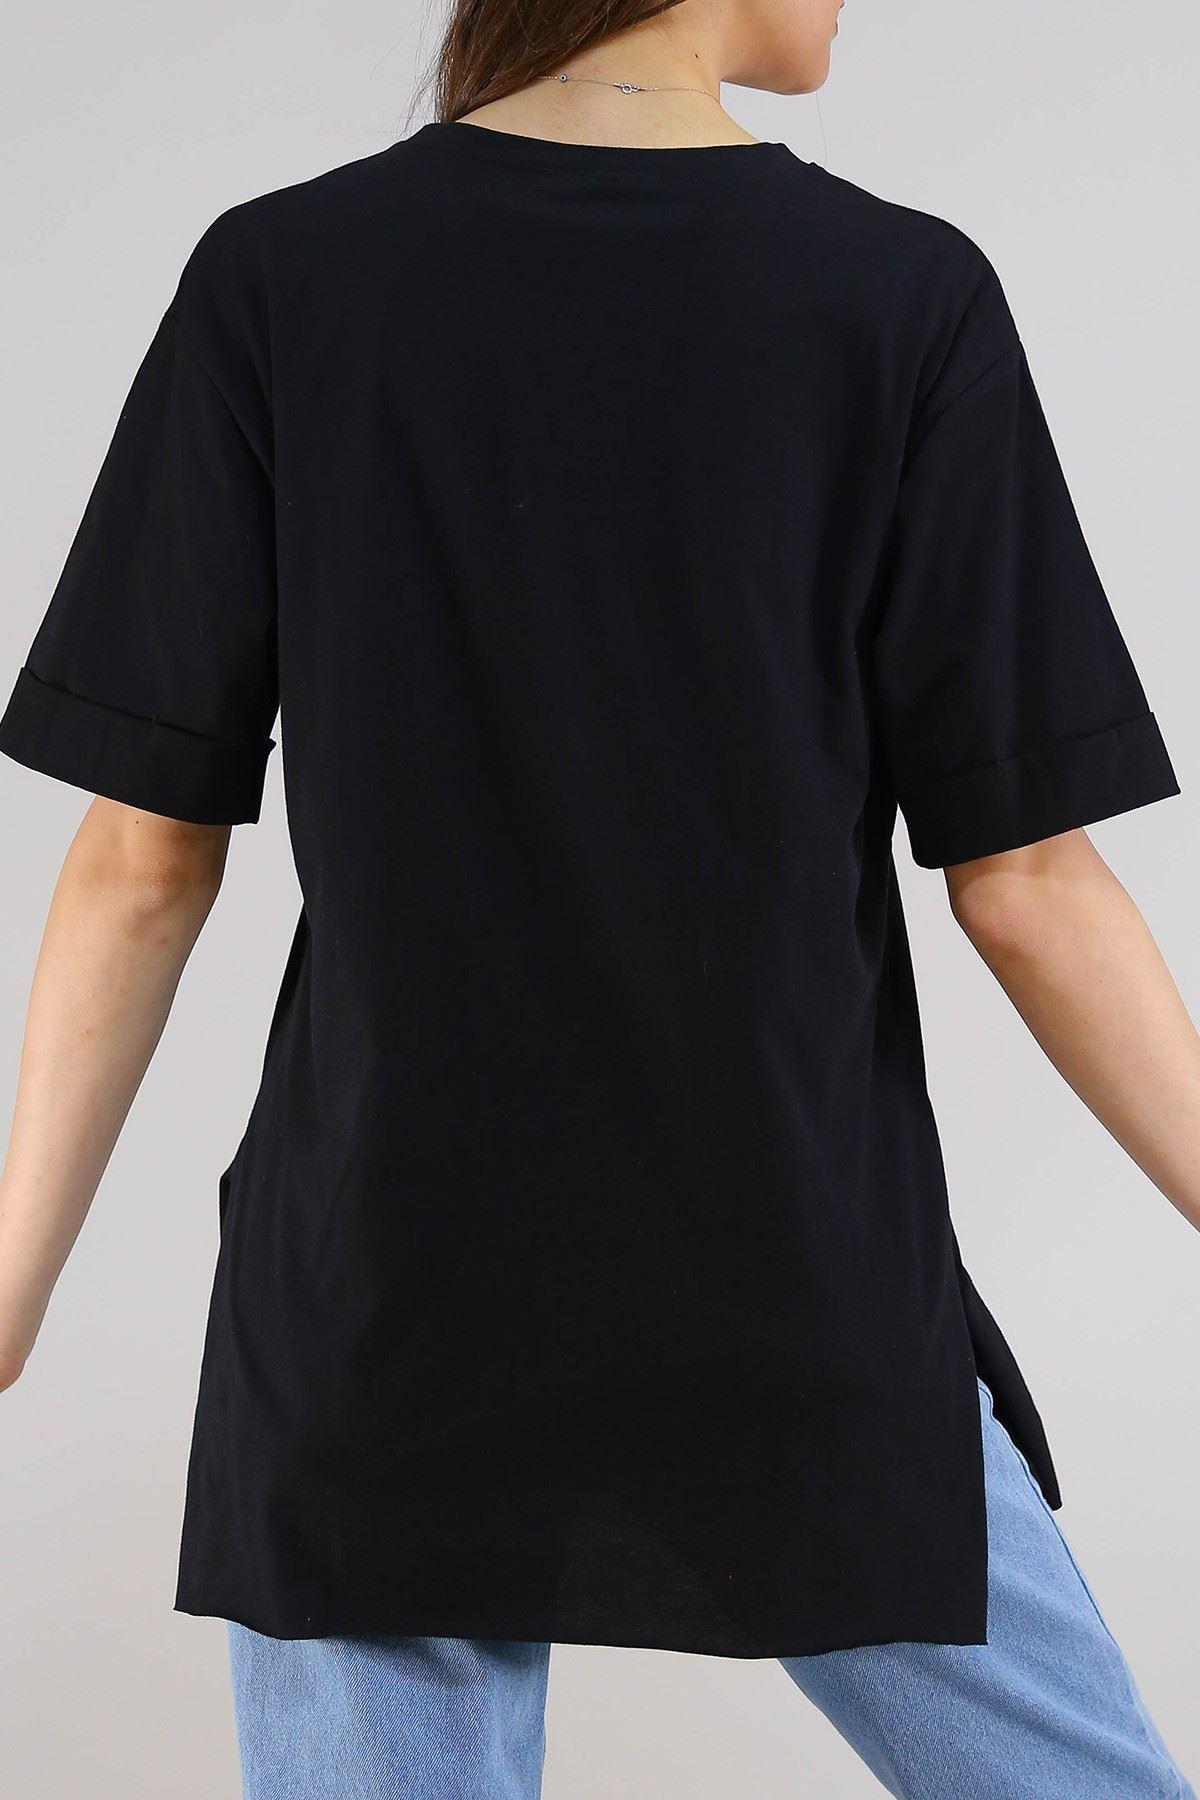 Duble Kol Tişört Siyah - 5270.1247. Toptan